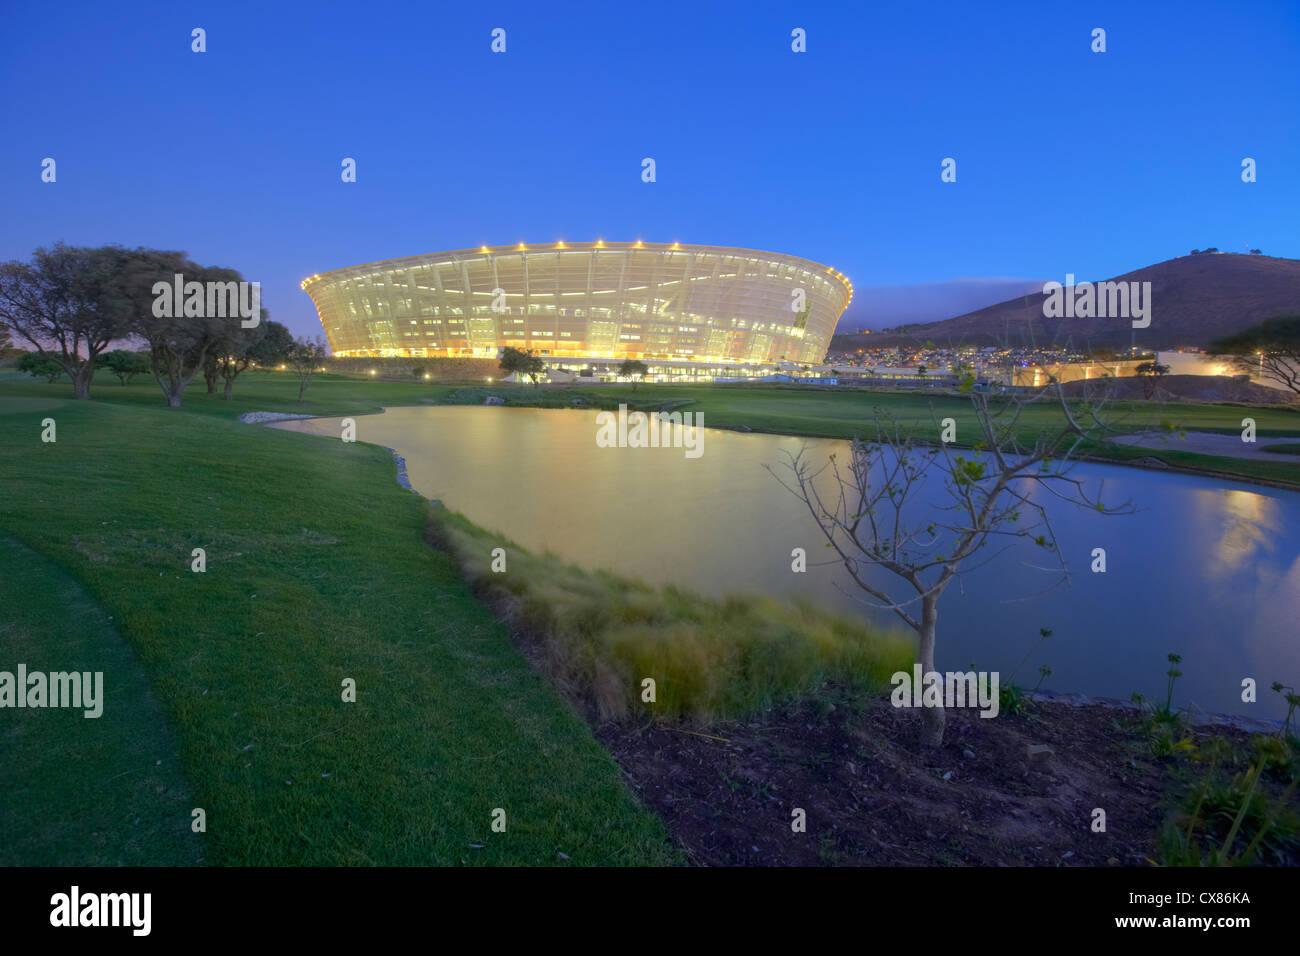 Greenpoint Stadium - Stock Image